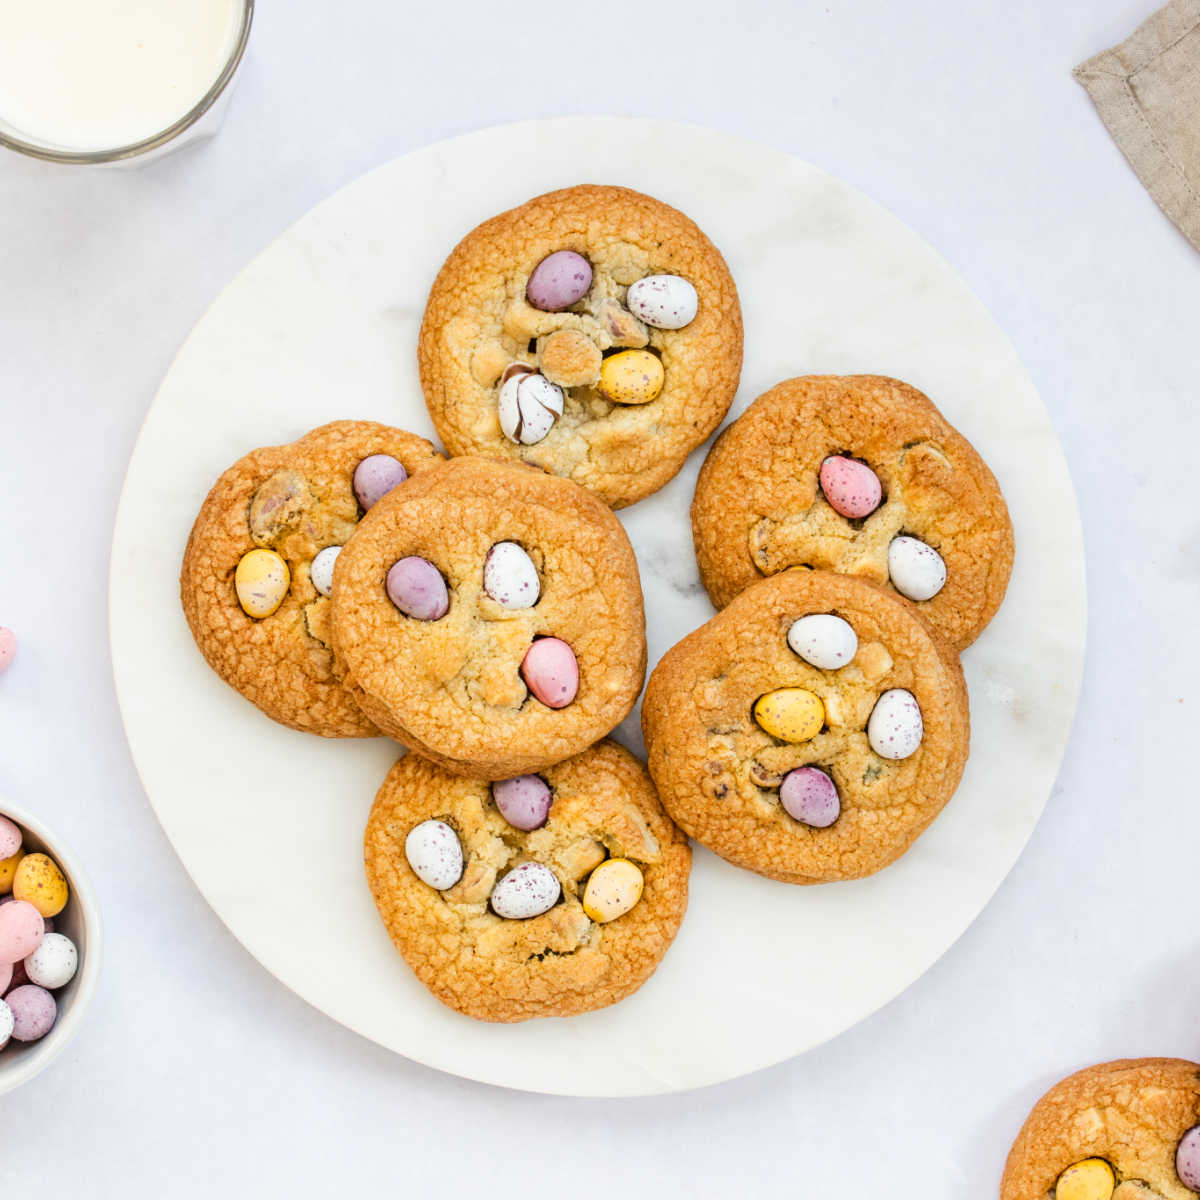 cadbury egg cookies on plate